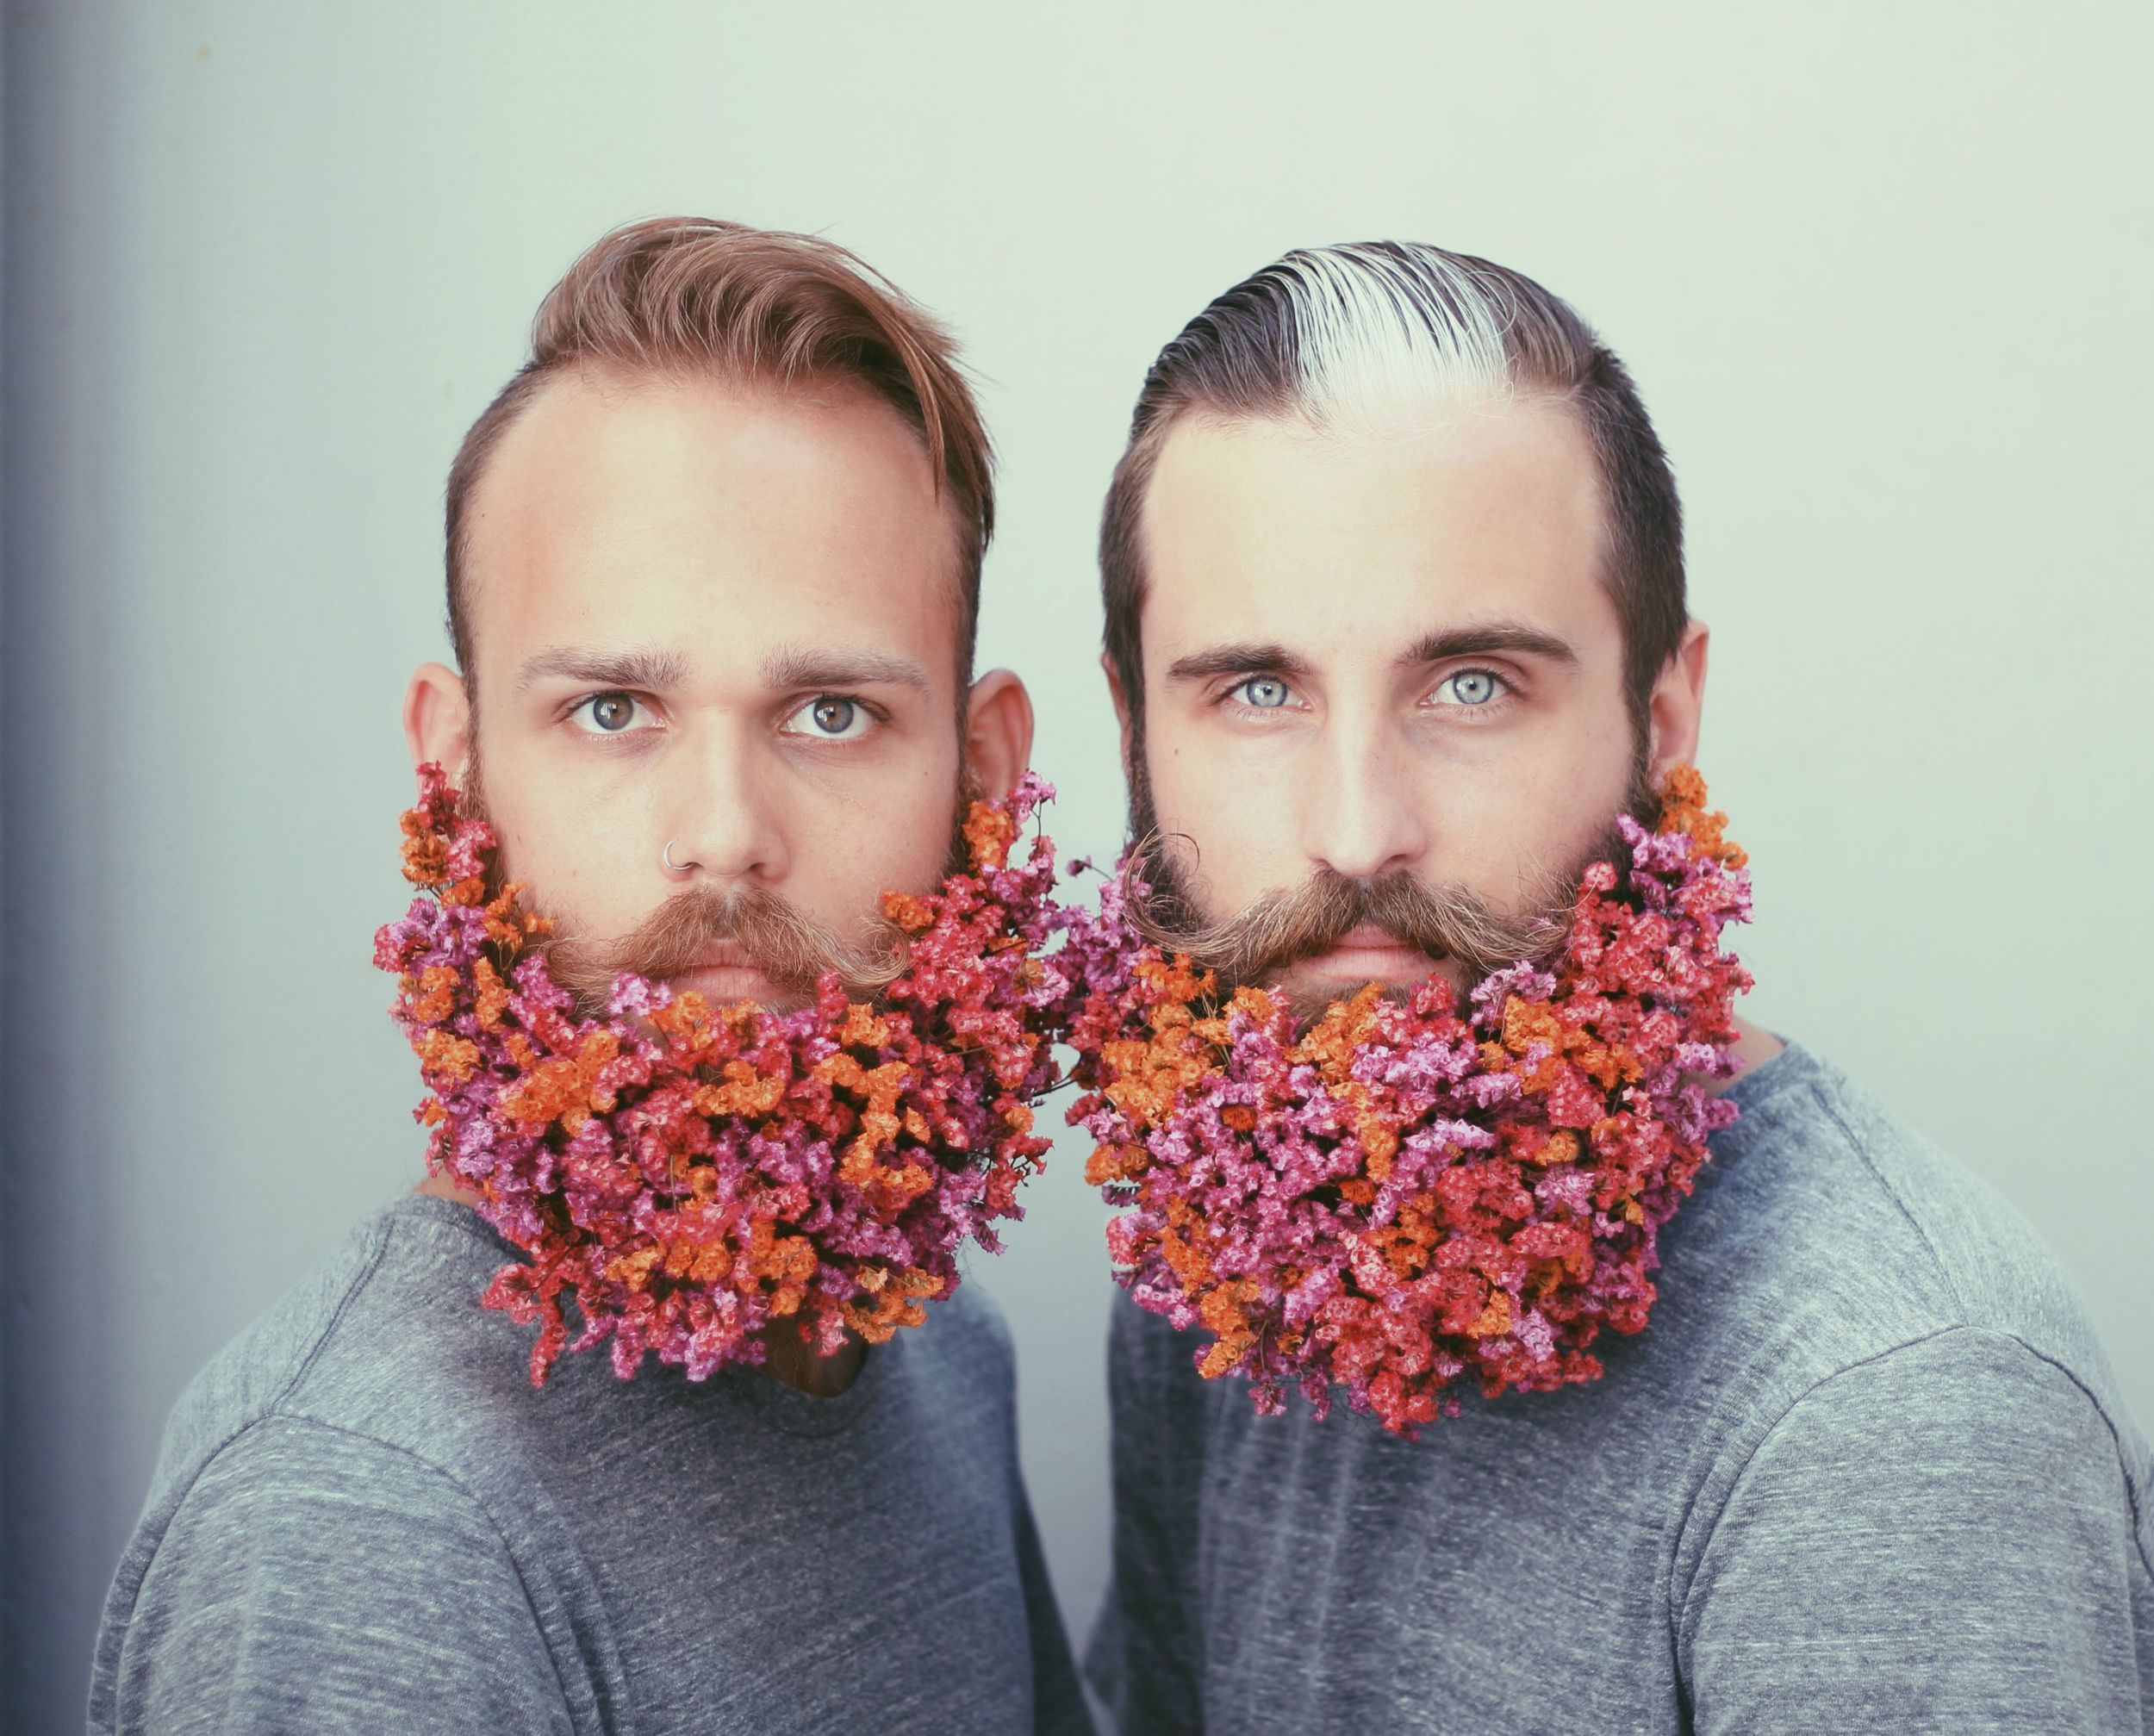 beard-holders-07.jpg